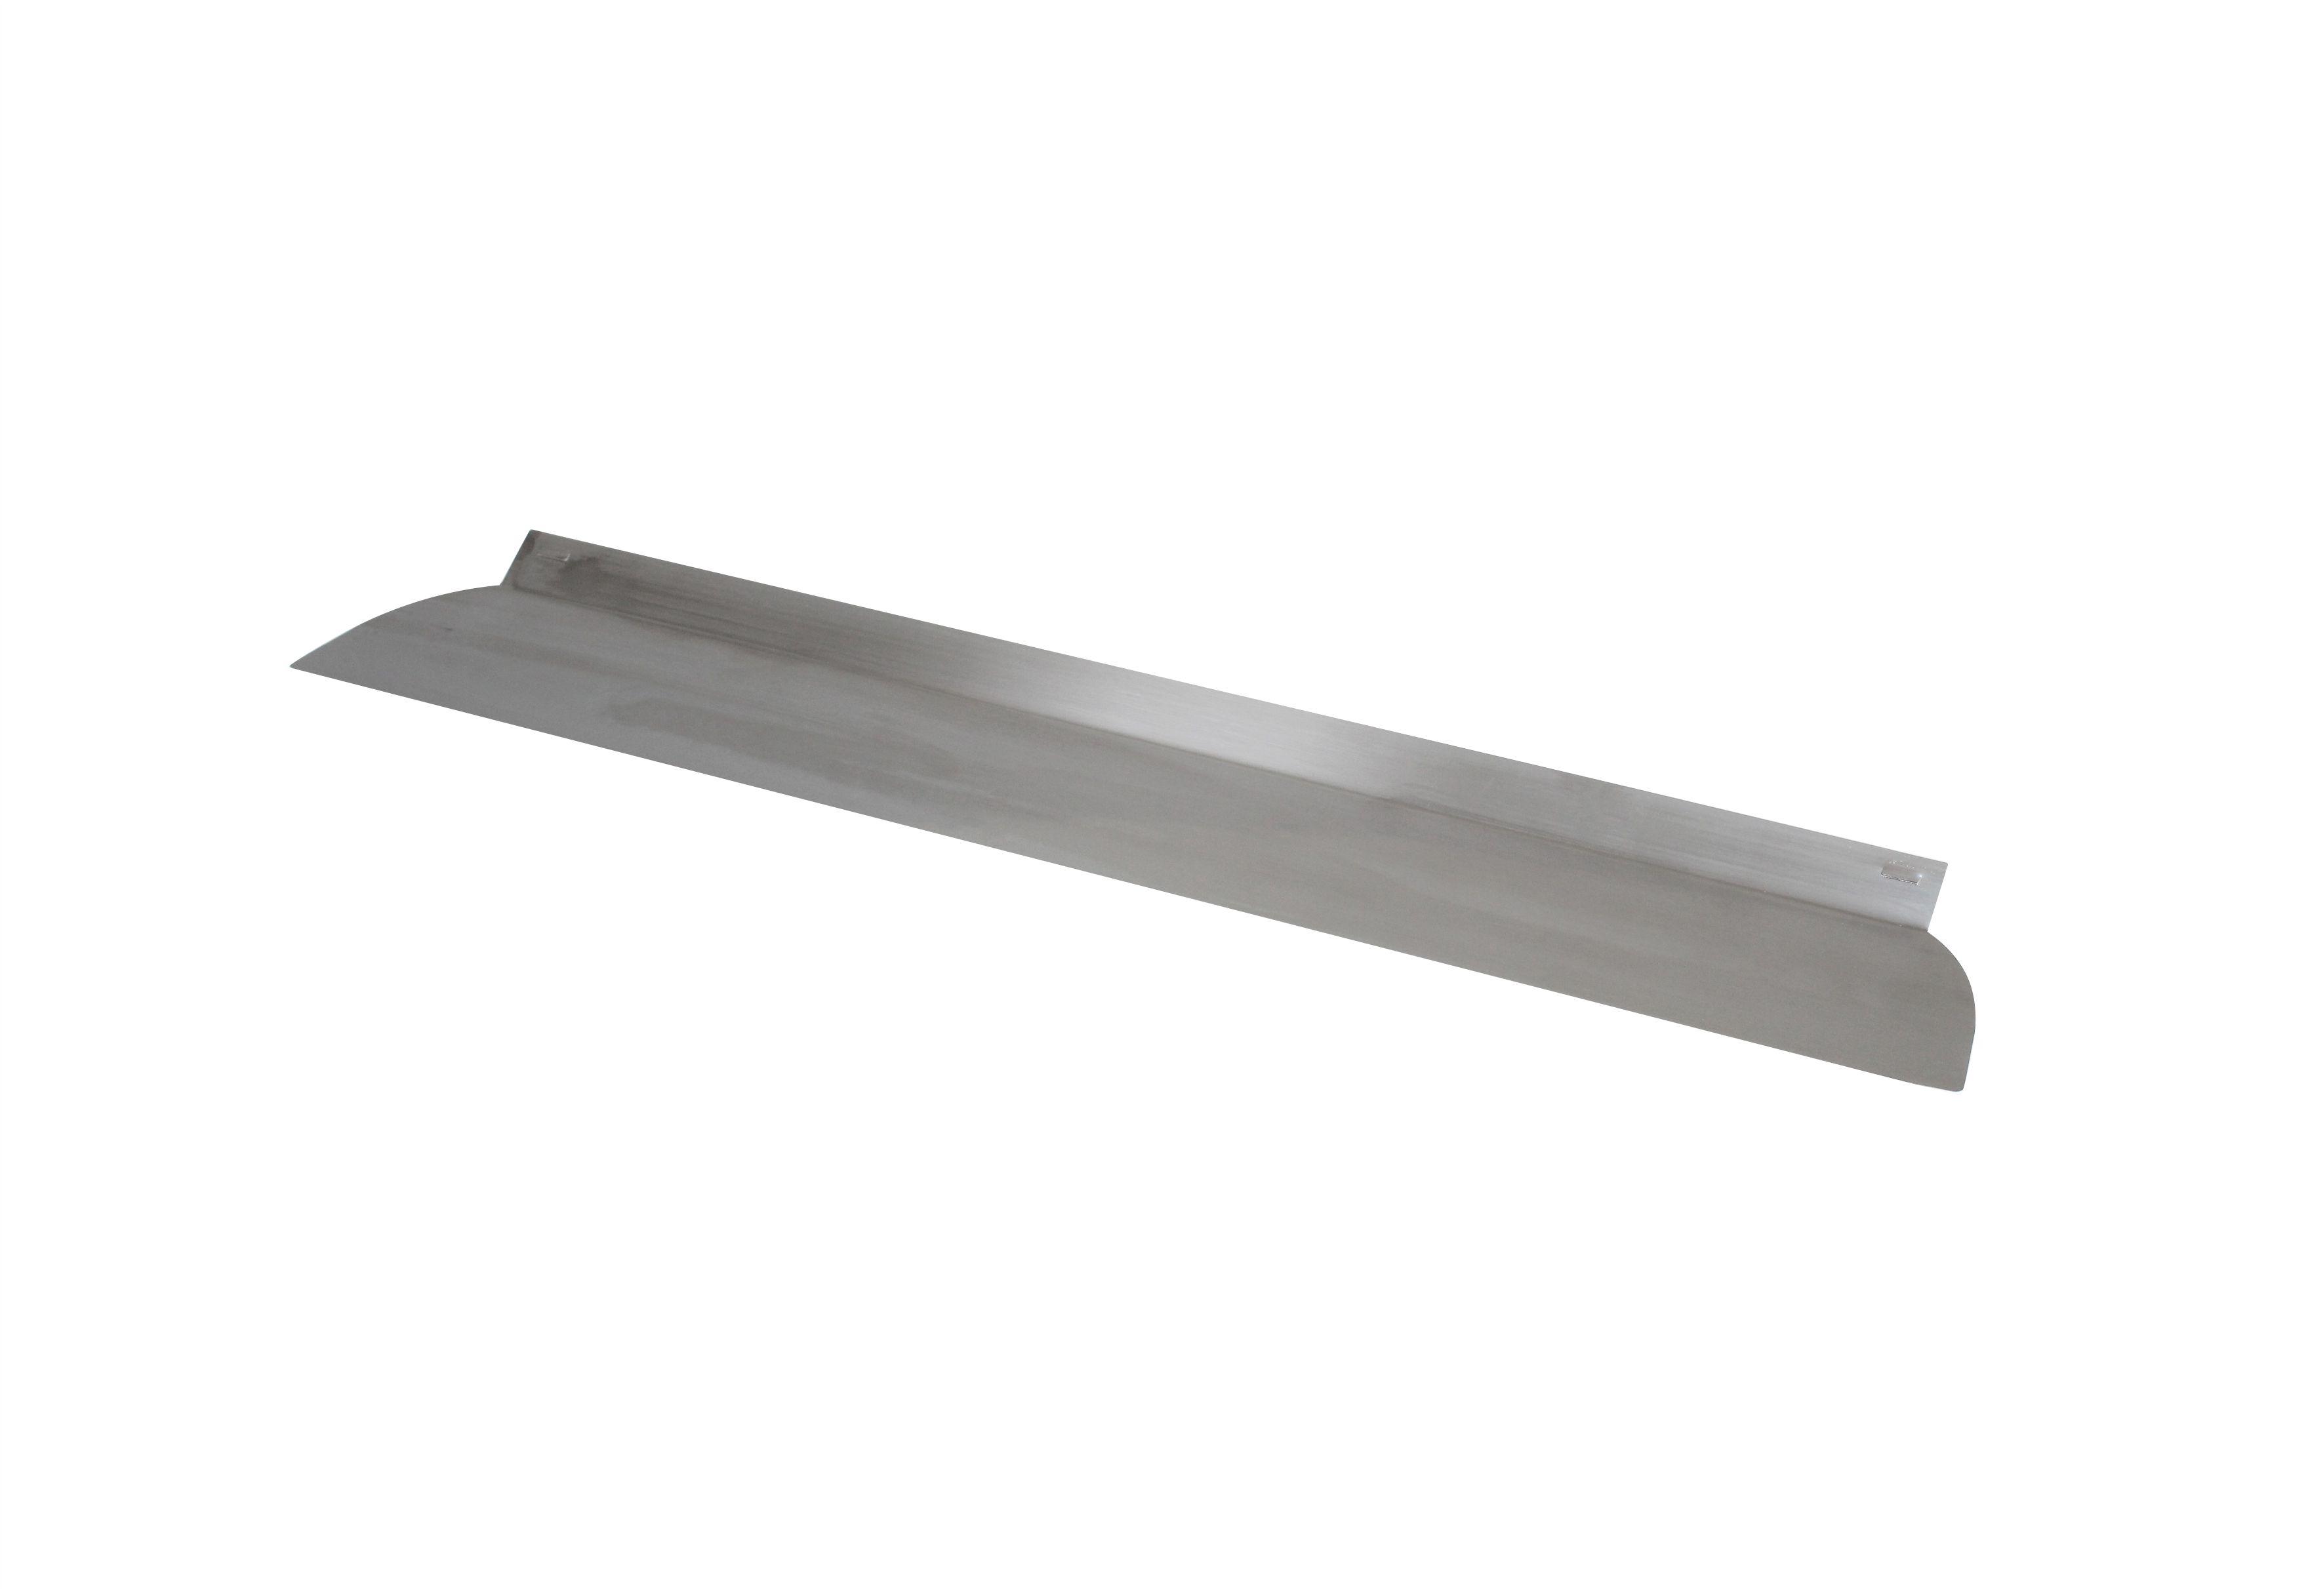 Ersatzblatt zu Profi-Flex-Spachtel 800 mm ( Nr. 0628 )